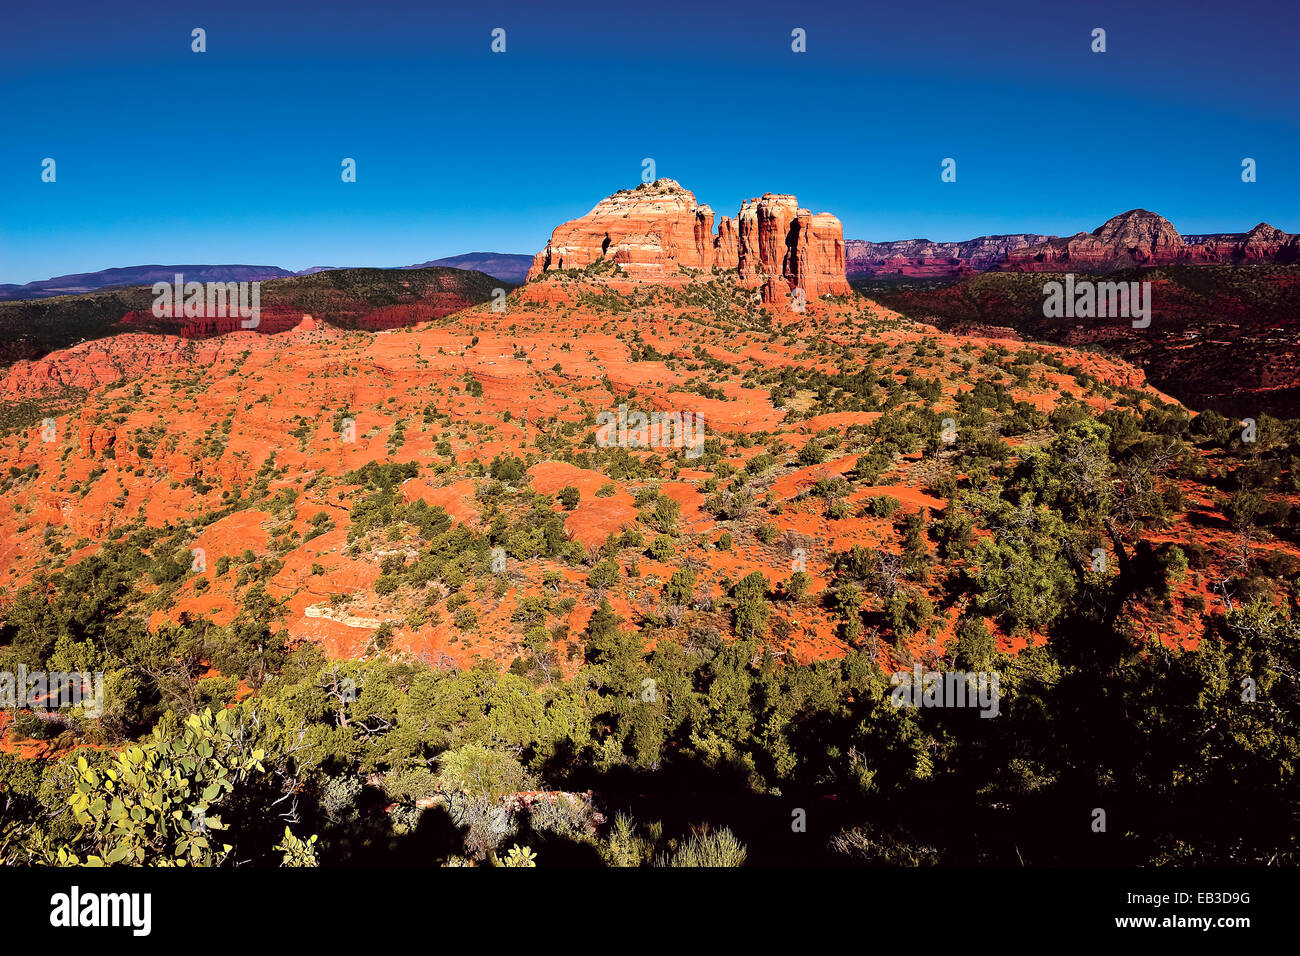 USA, Arizona, Yavapai Comté, Sedona, Cathedral Rock vu du sentier Hiline Vista east side Photo Stock